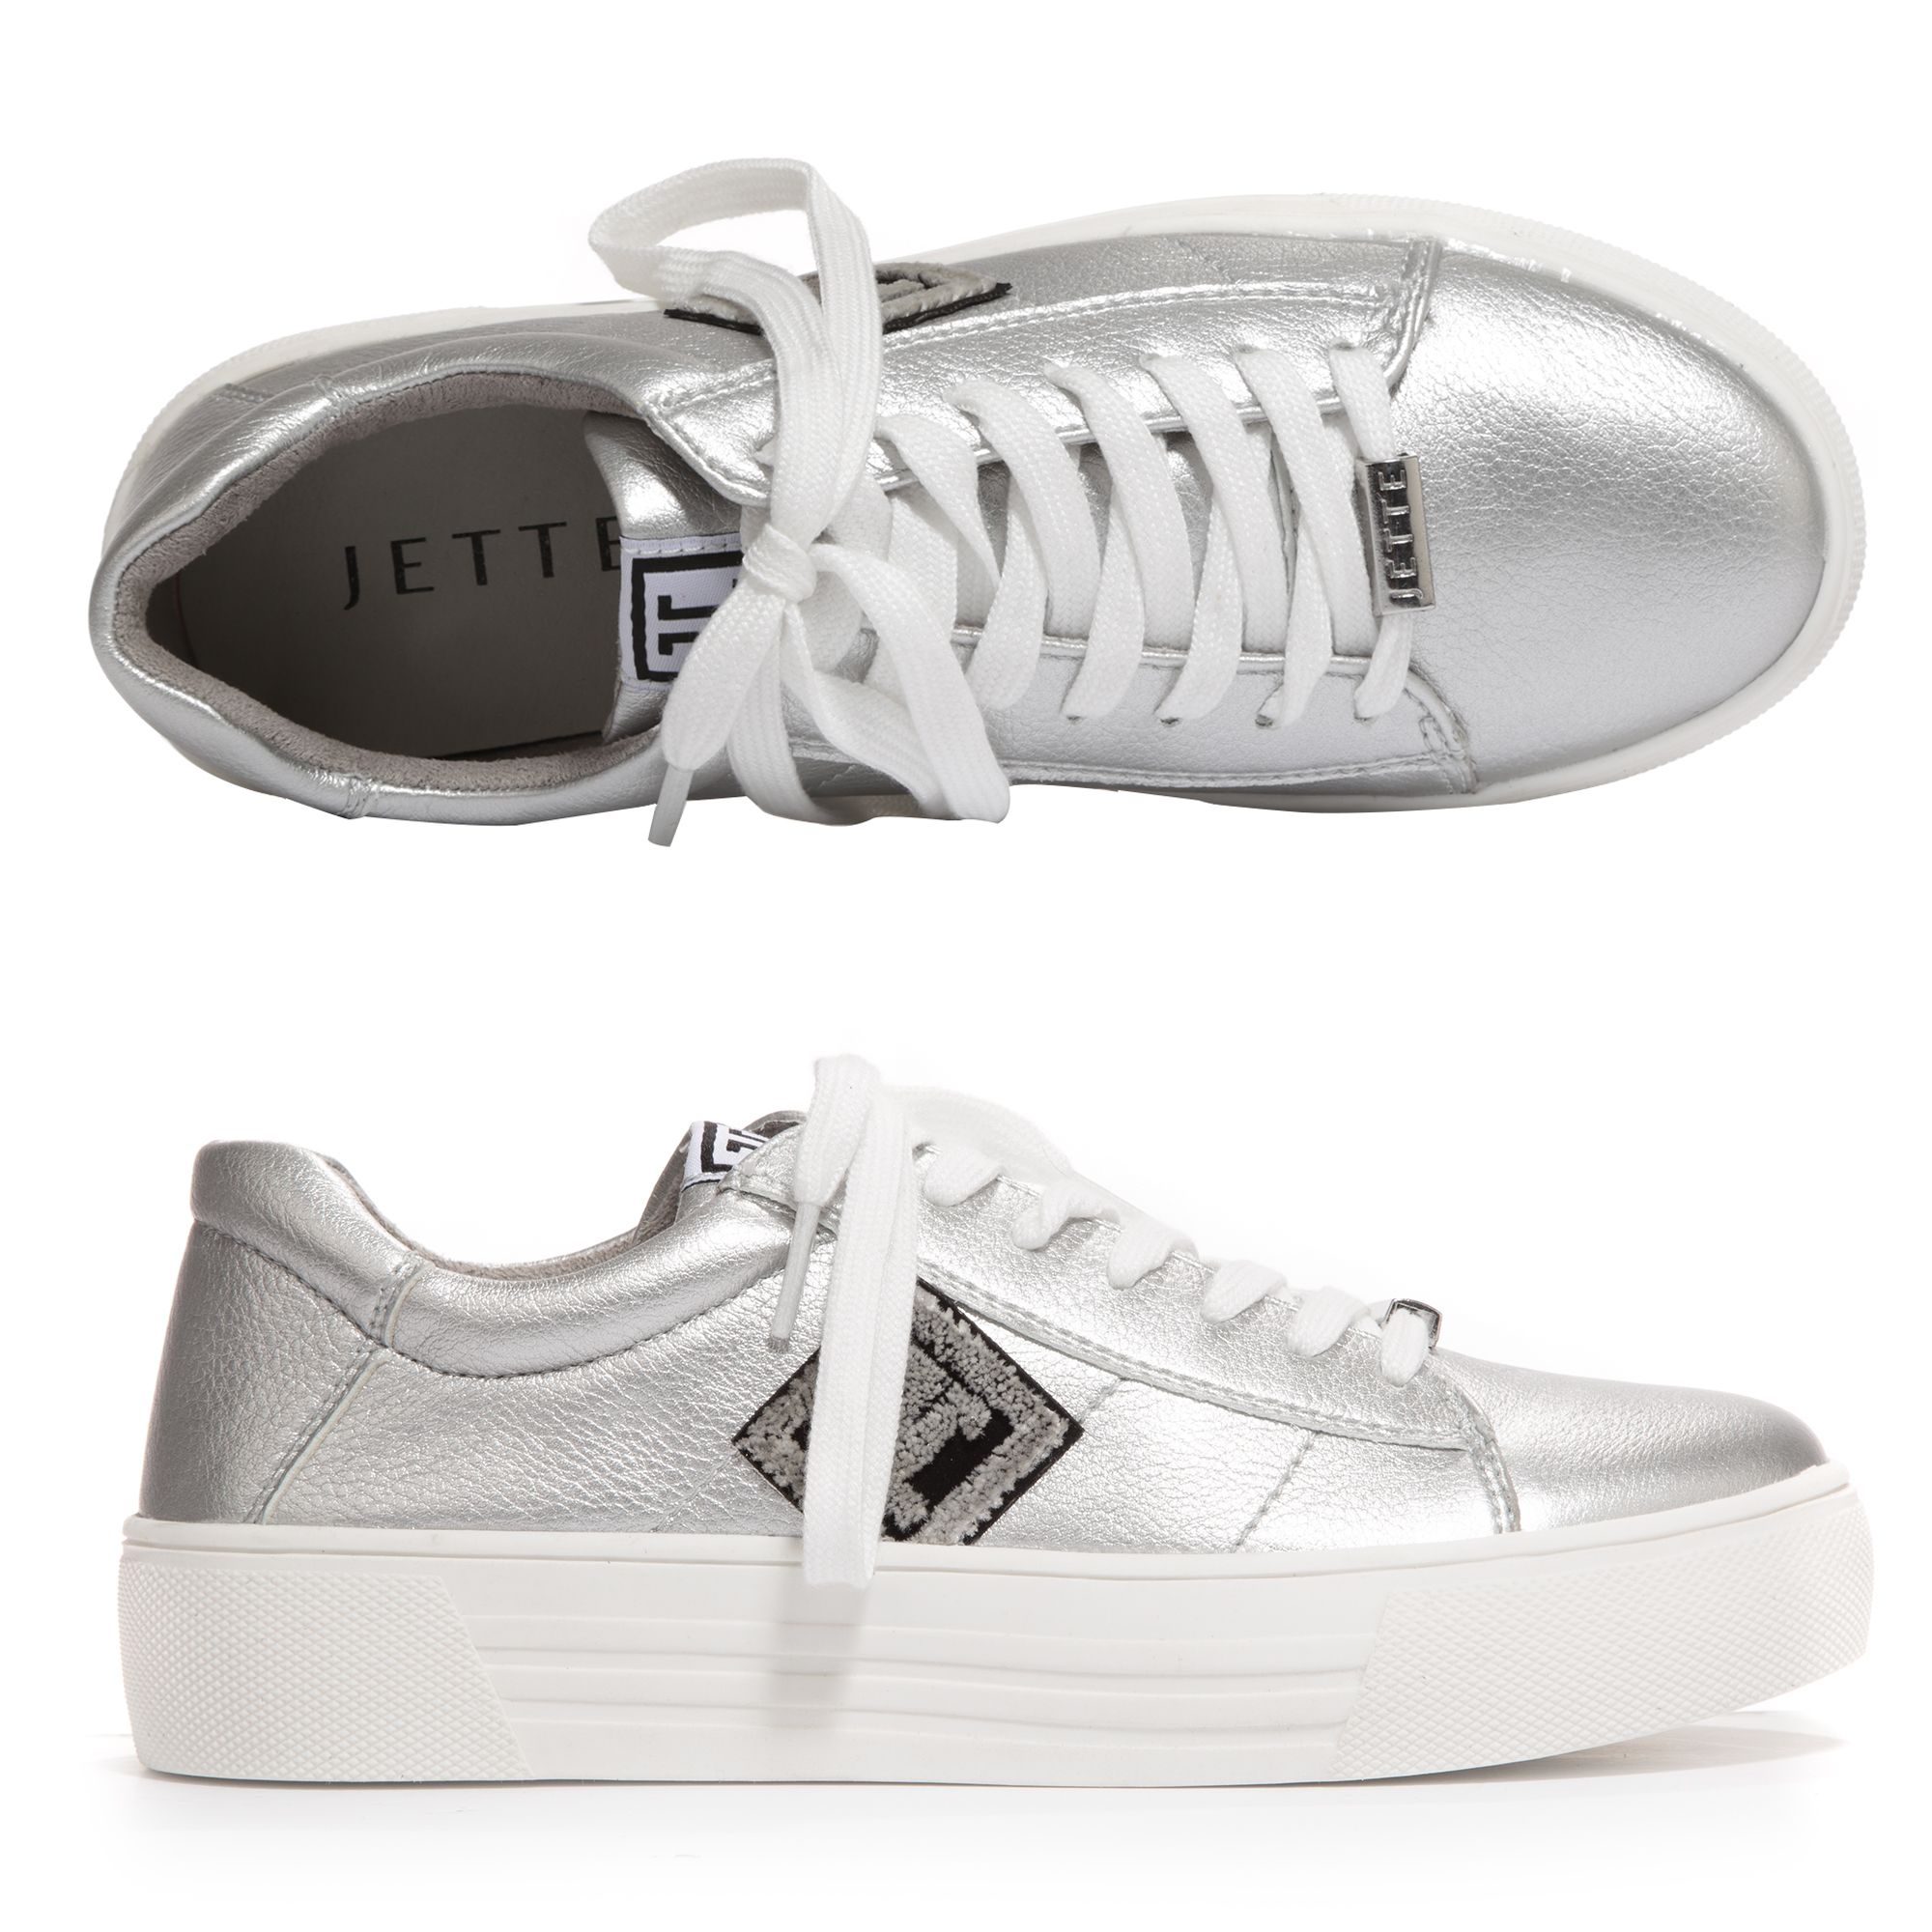 promo code e0a39 66335 JETTE Damen-Sneaker Lederimitat Applikation an Seite Plateausohle — QVC.de